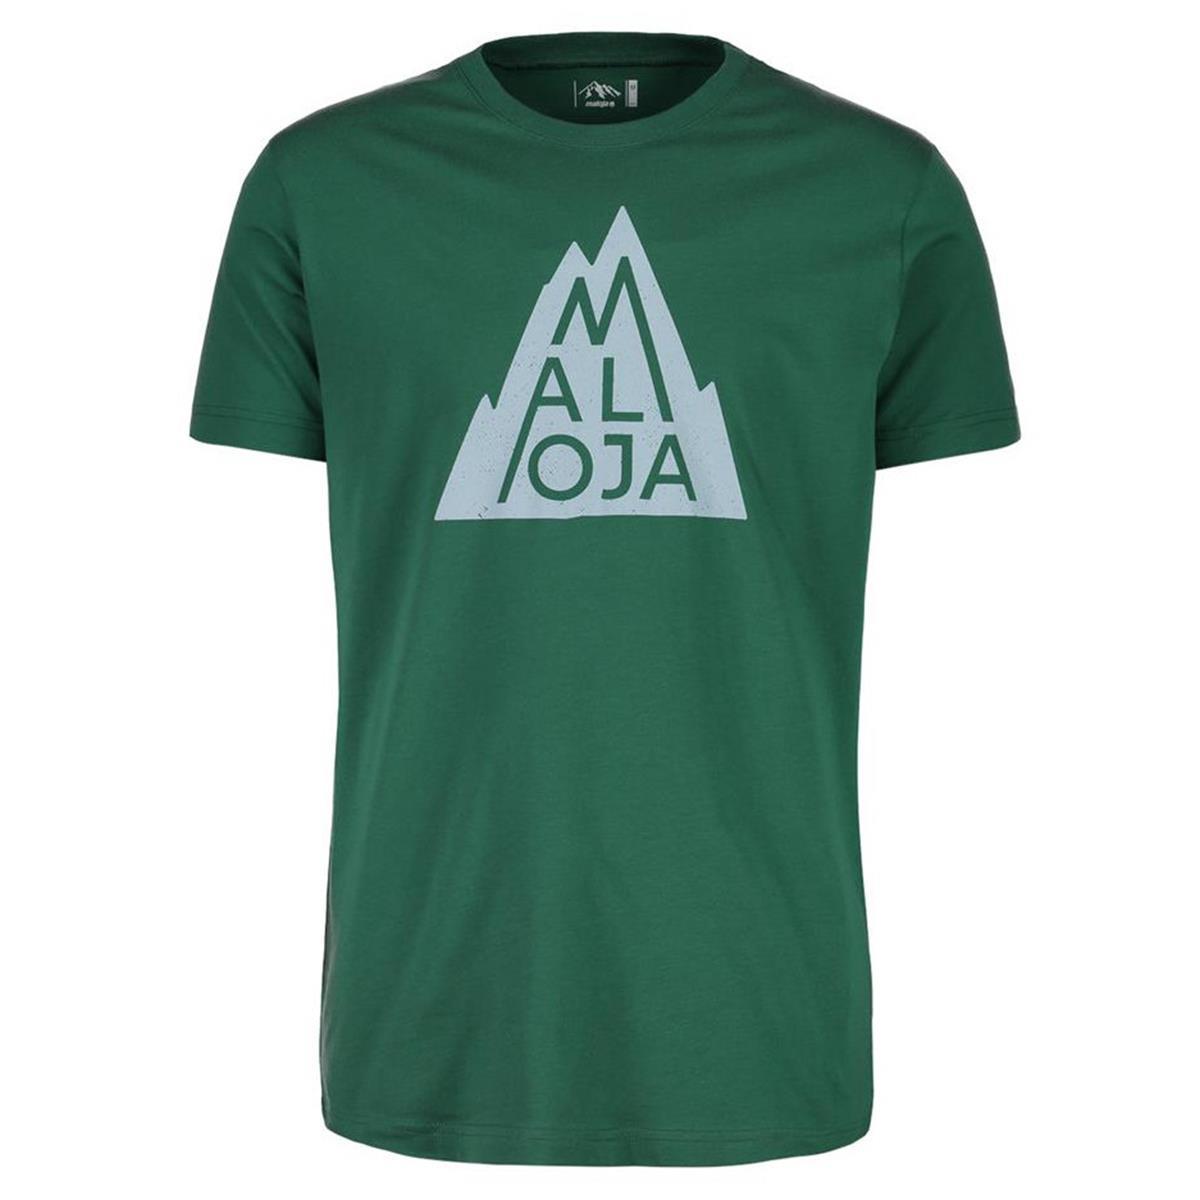 Maloja T-Shirt ChristiamM. Stone Pine